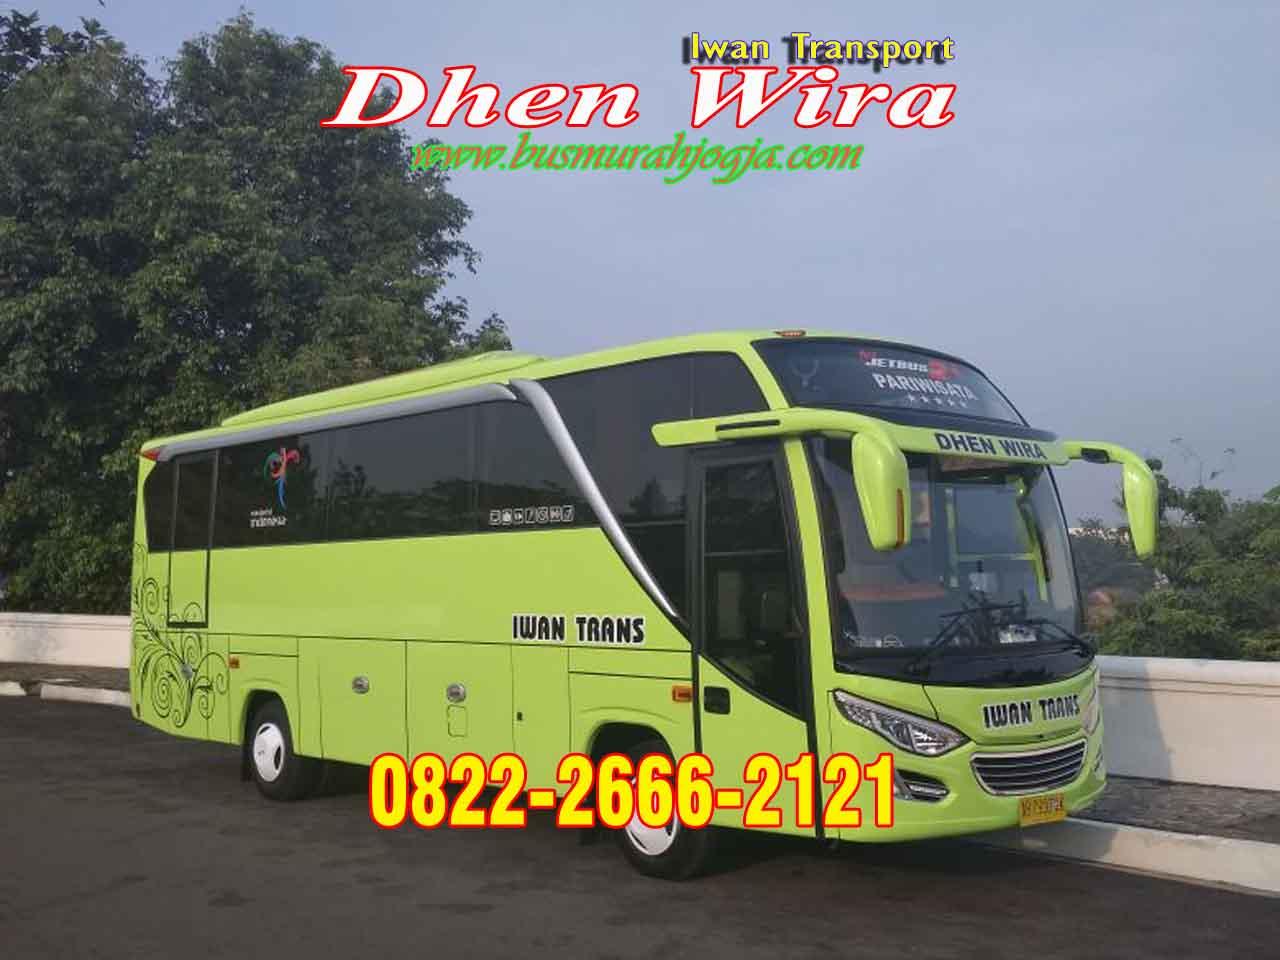 Sewa Bus Jogja Murah Sewa Bus Wisata Jogja Dhen Wira Sewa Bus Wisata Yogyakarta Murah Iwan Transport (27)